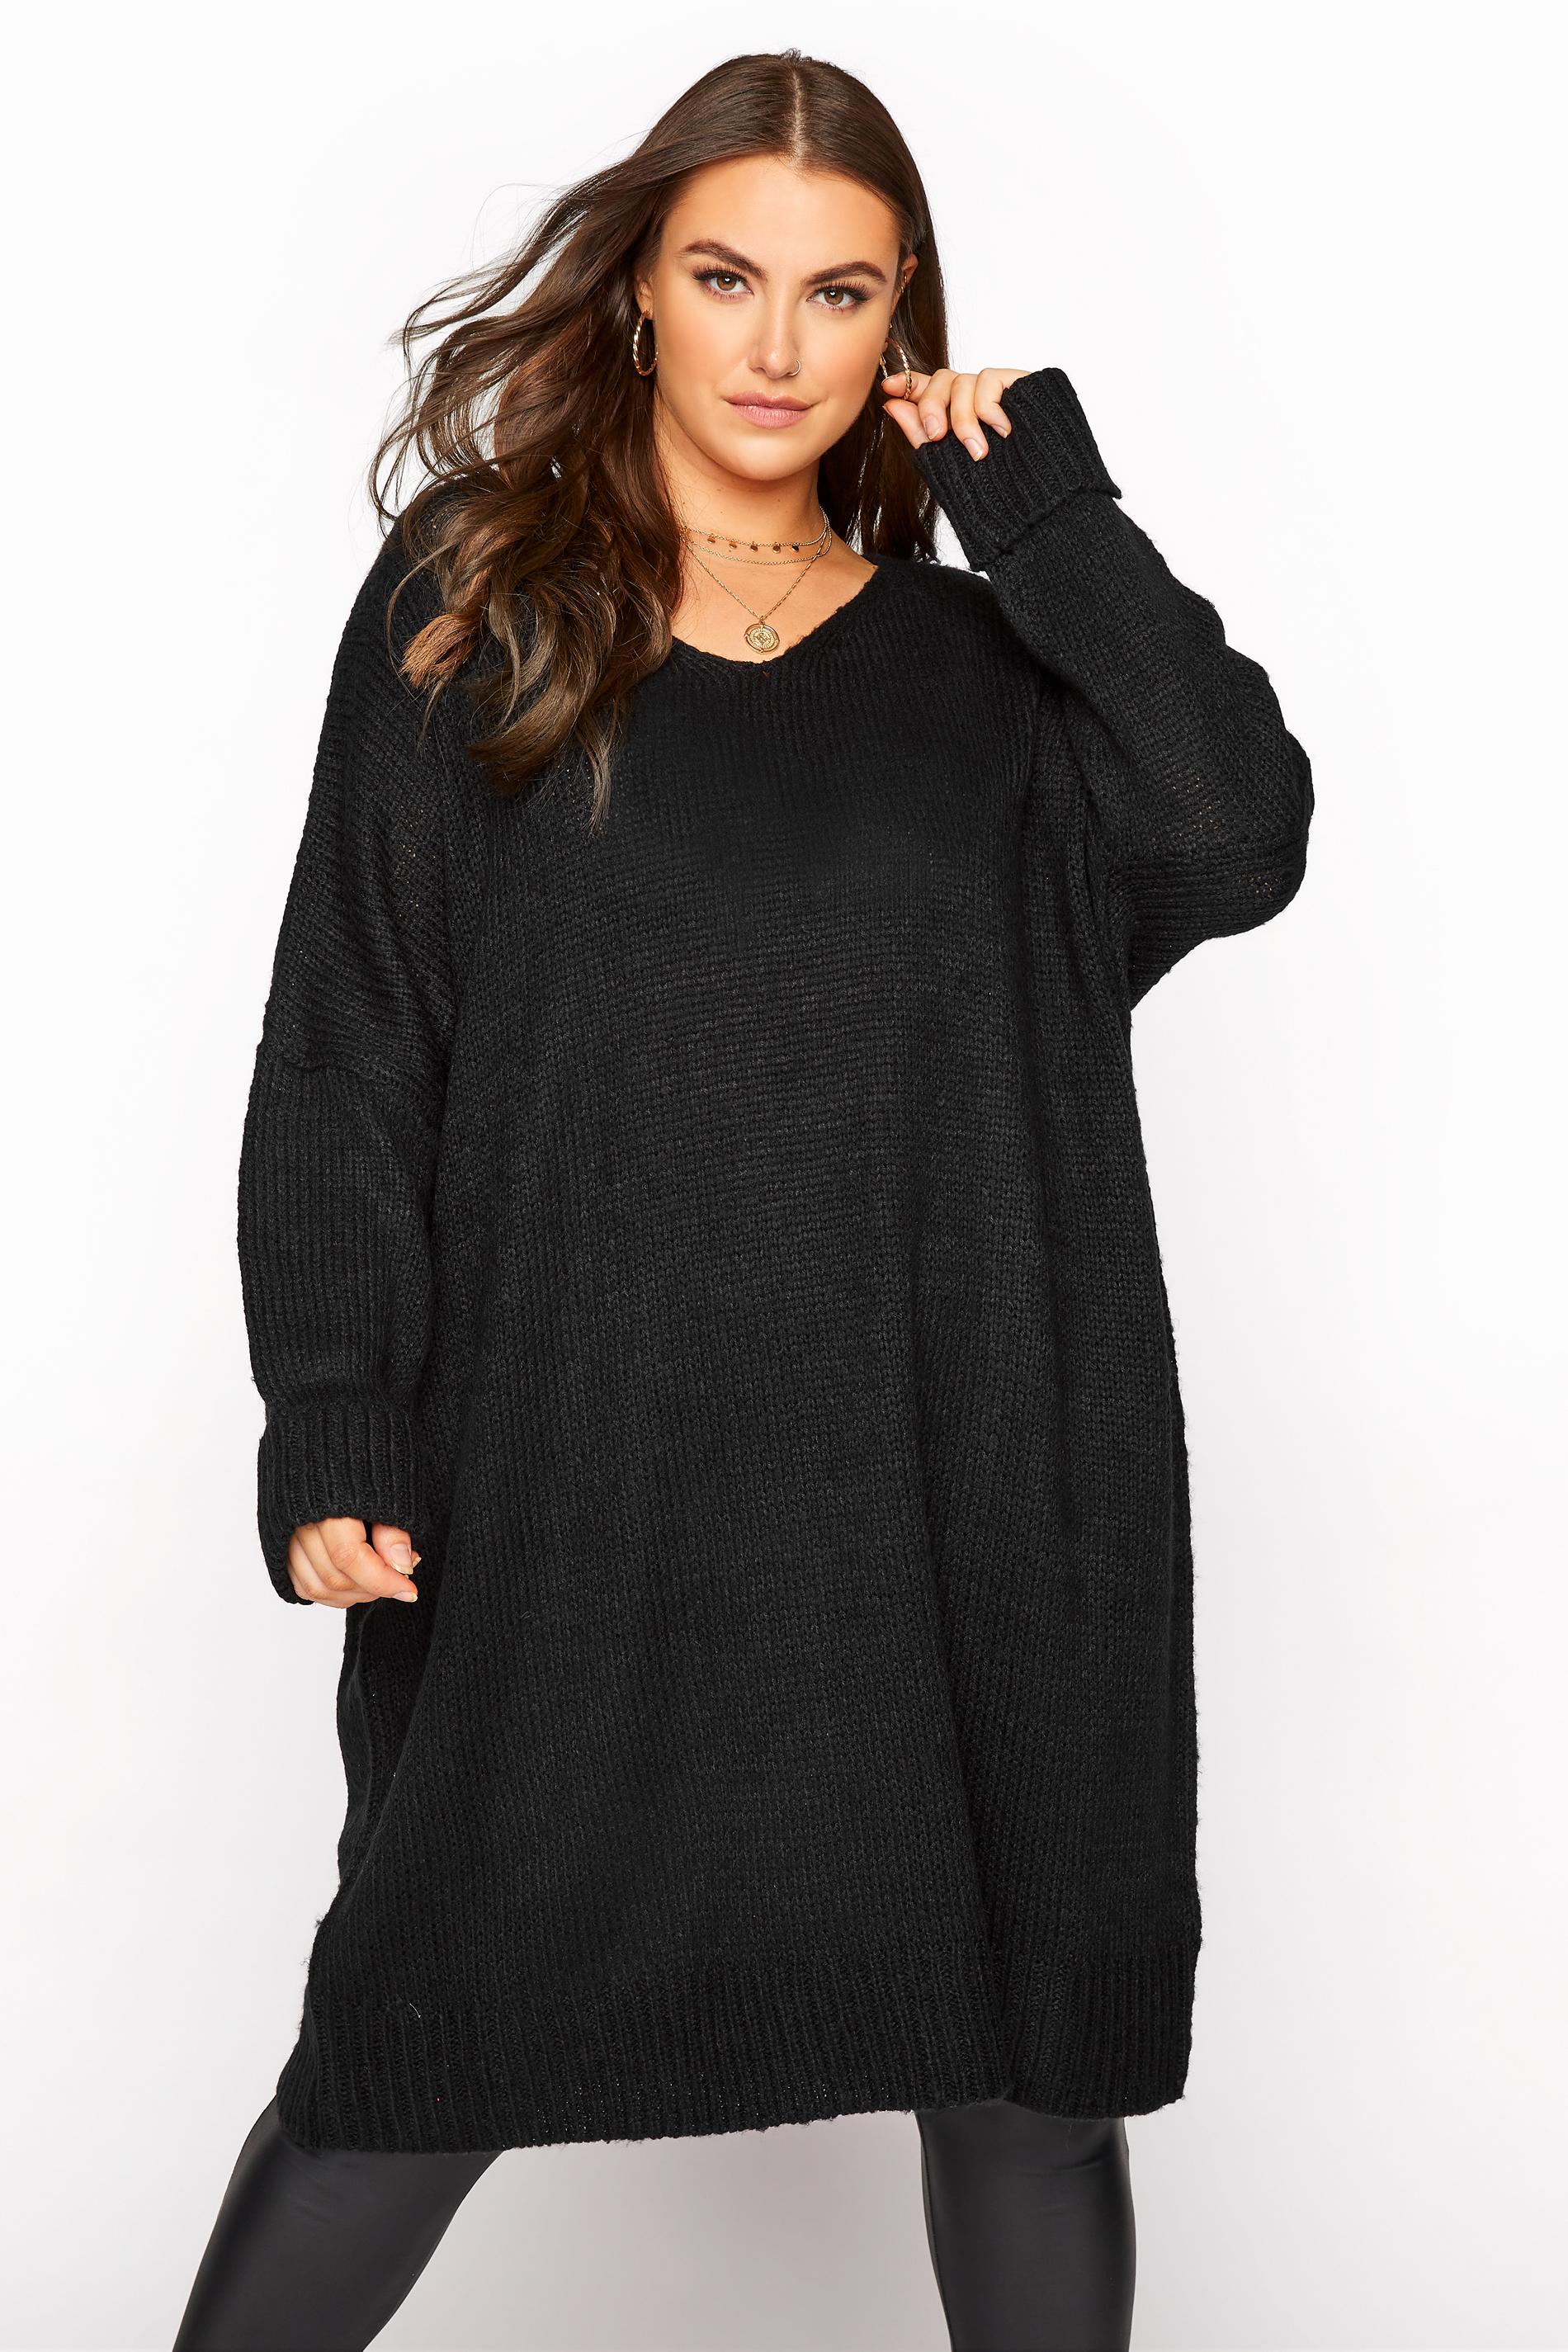 Black Drop Sleeve Knitted Jumper Dress_A.jpg